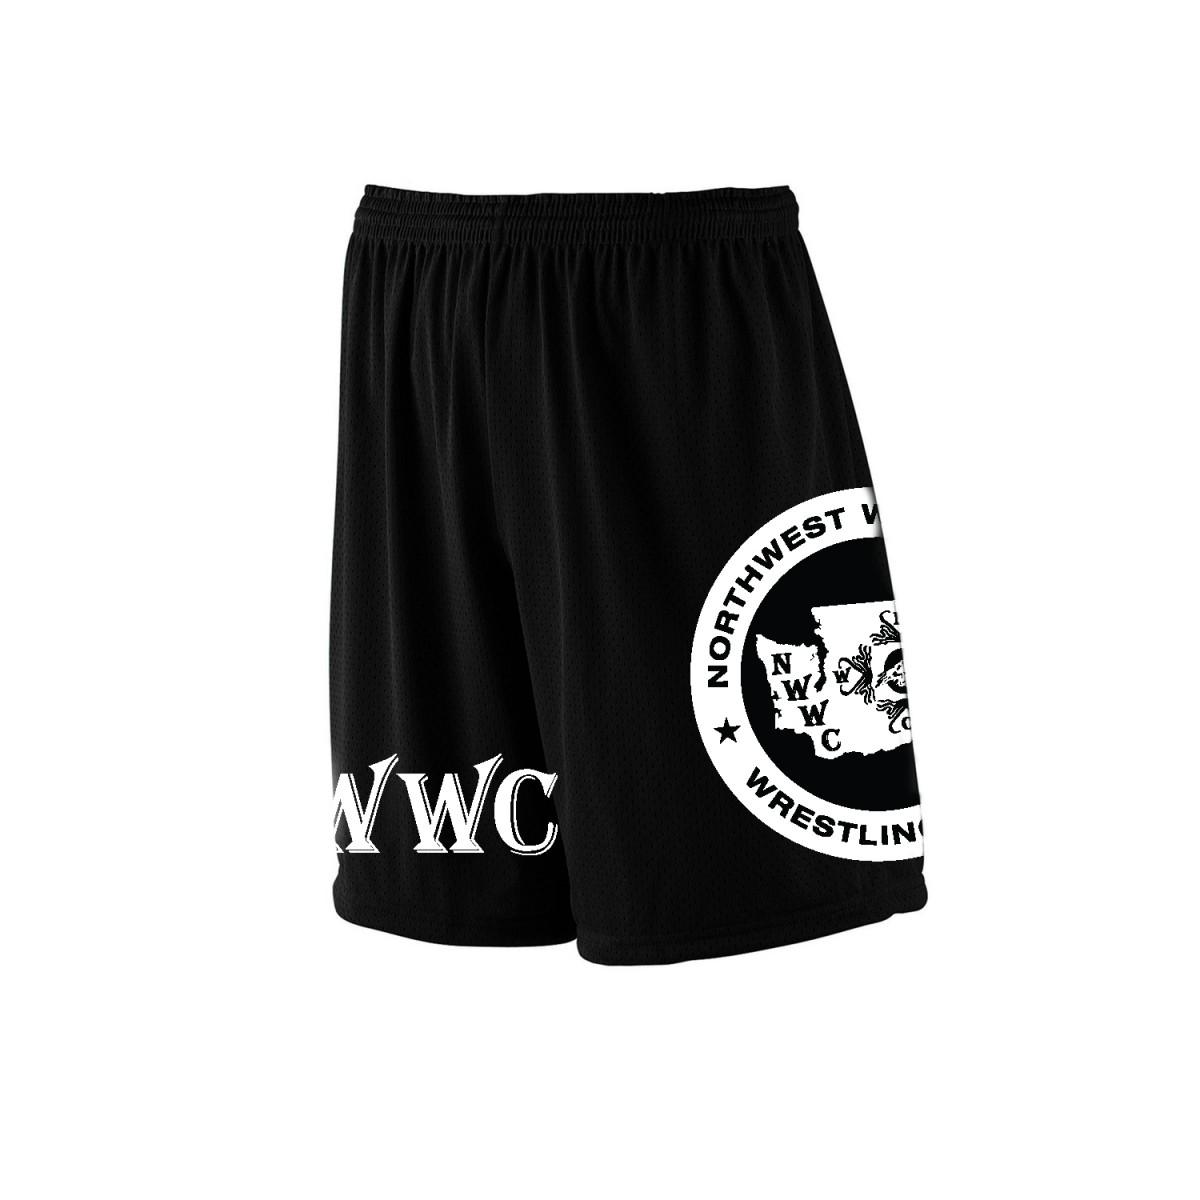 NWWC Black Shorts White Logo-Black-YM